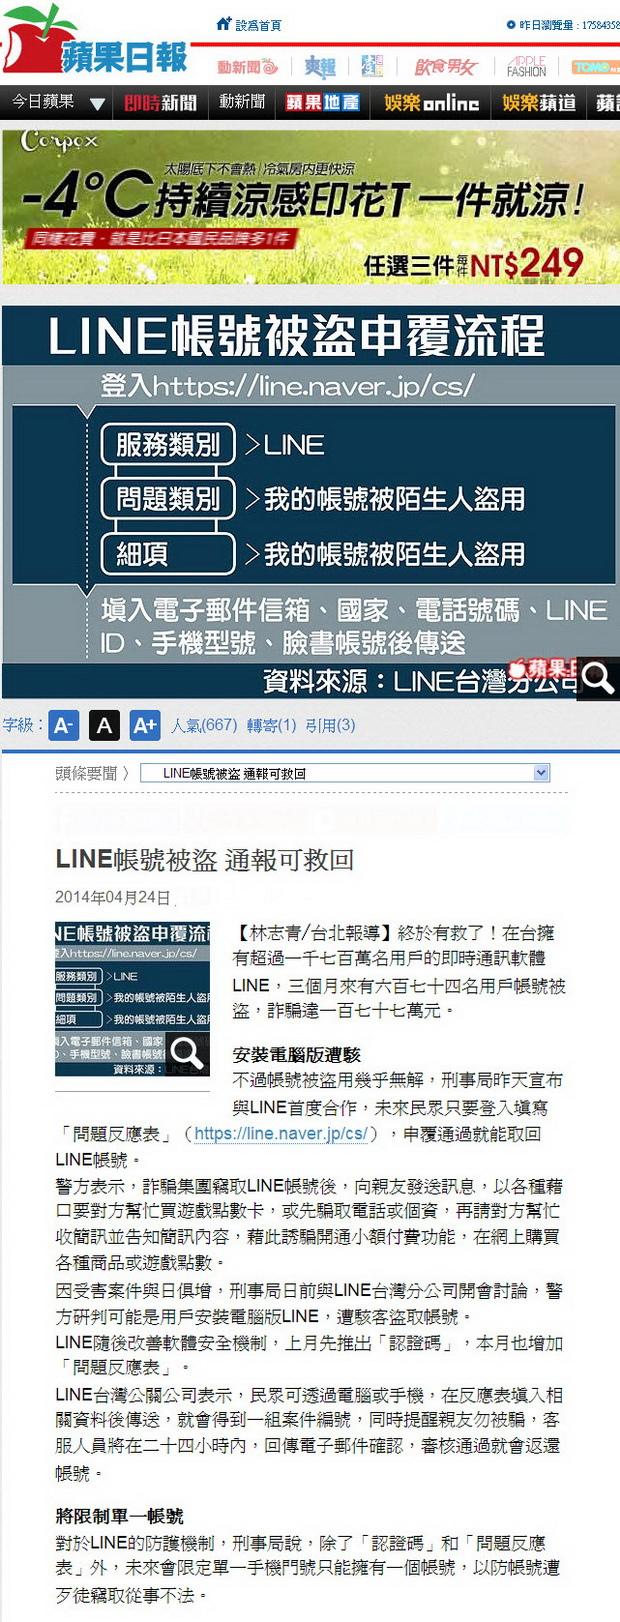 LINE帳號被盜 通報可救回-2014.04.24.jpg